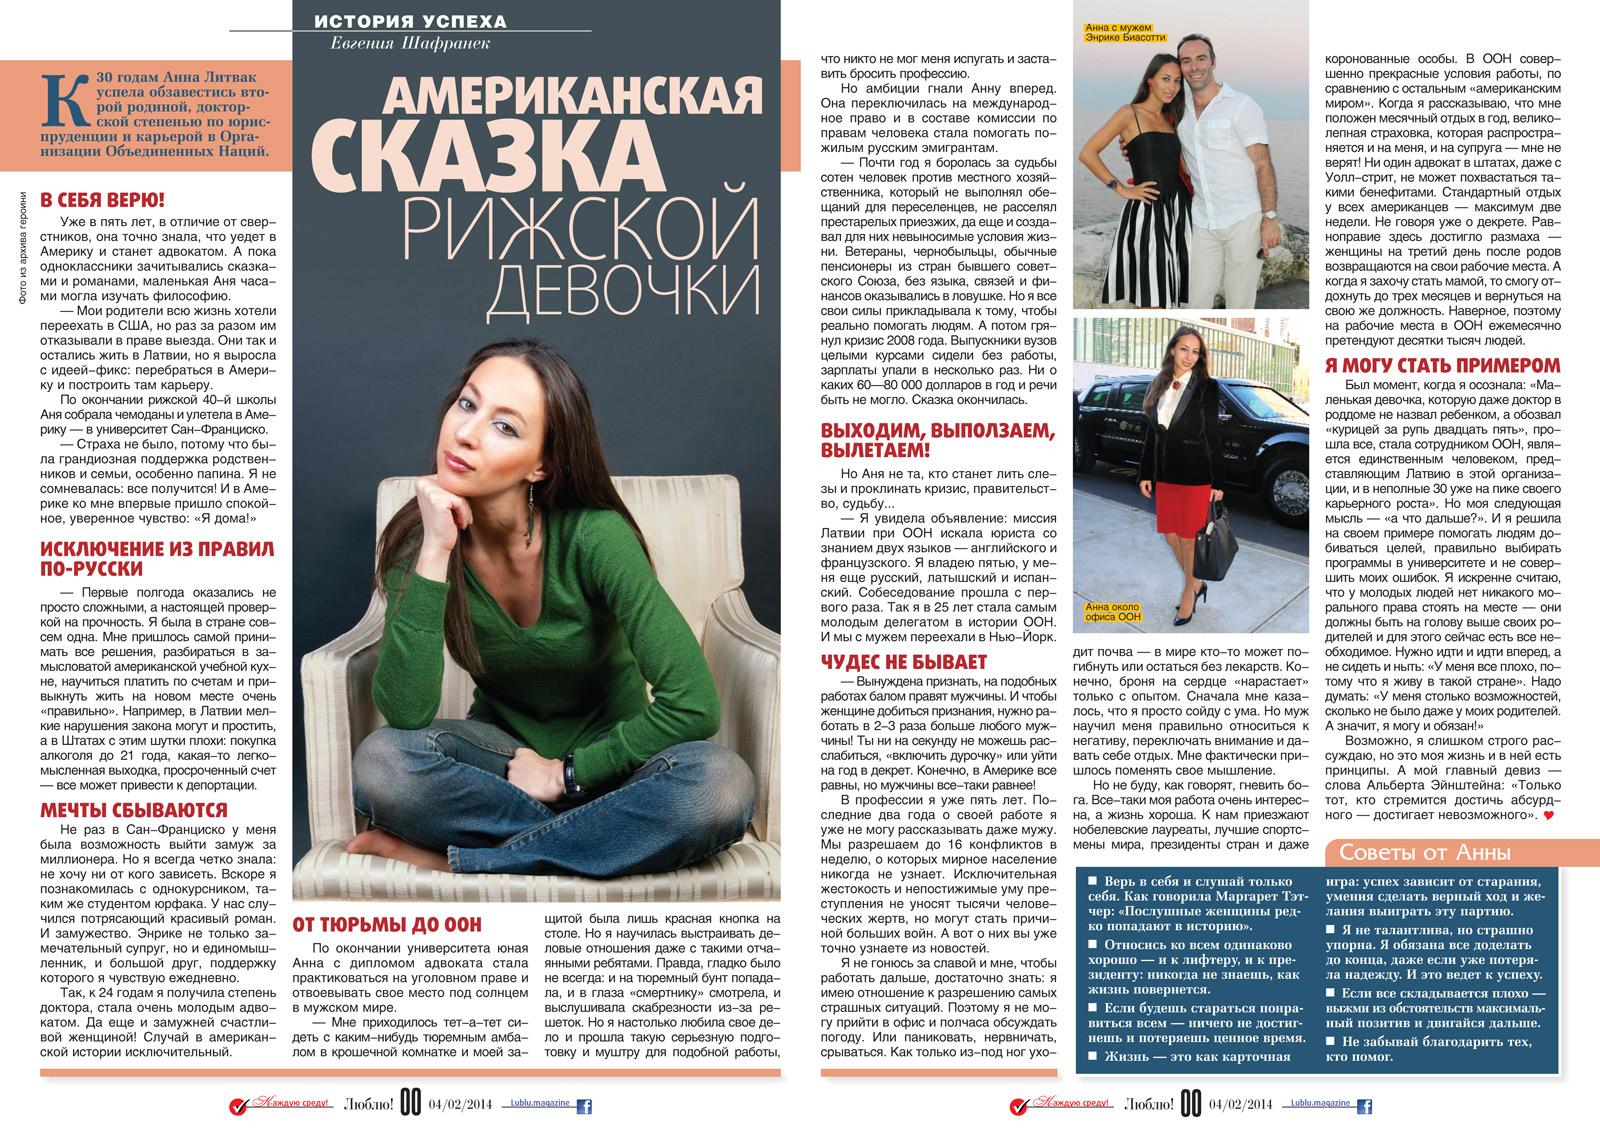 Istorija-uspeha_new(2)